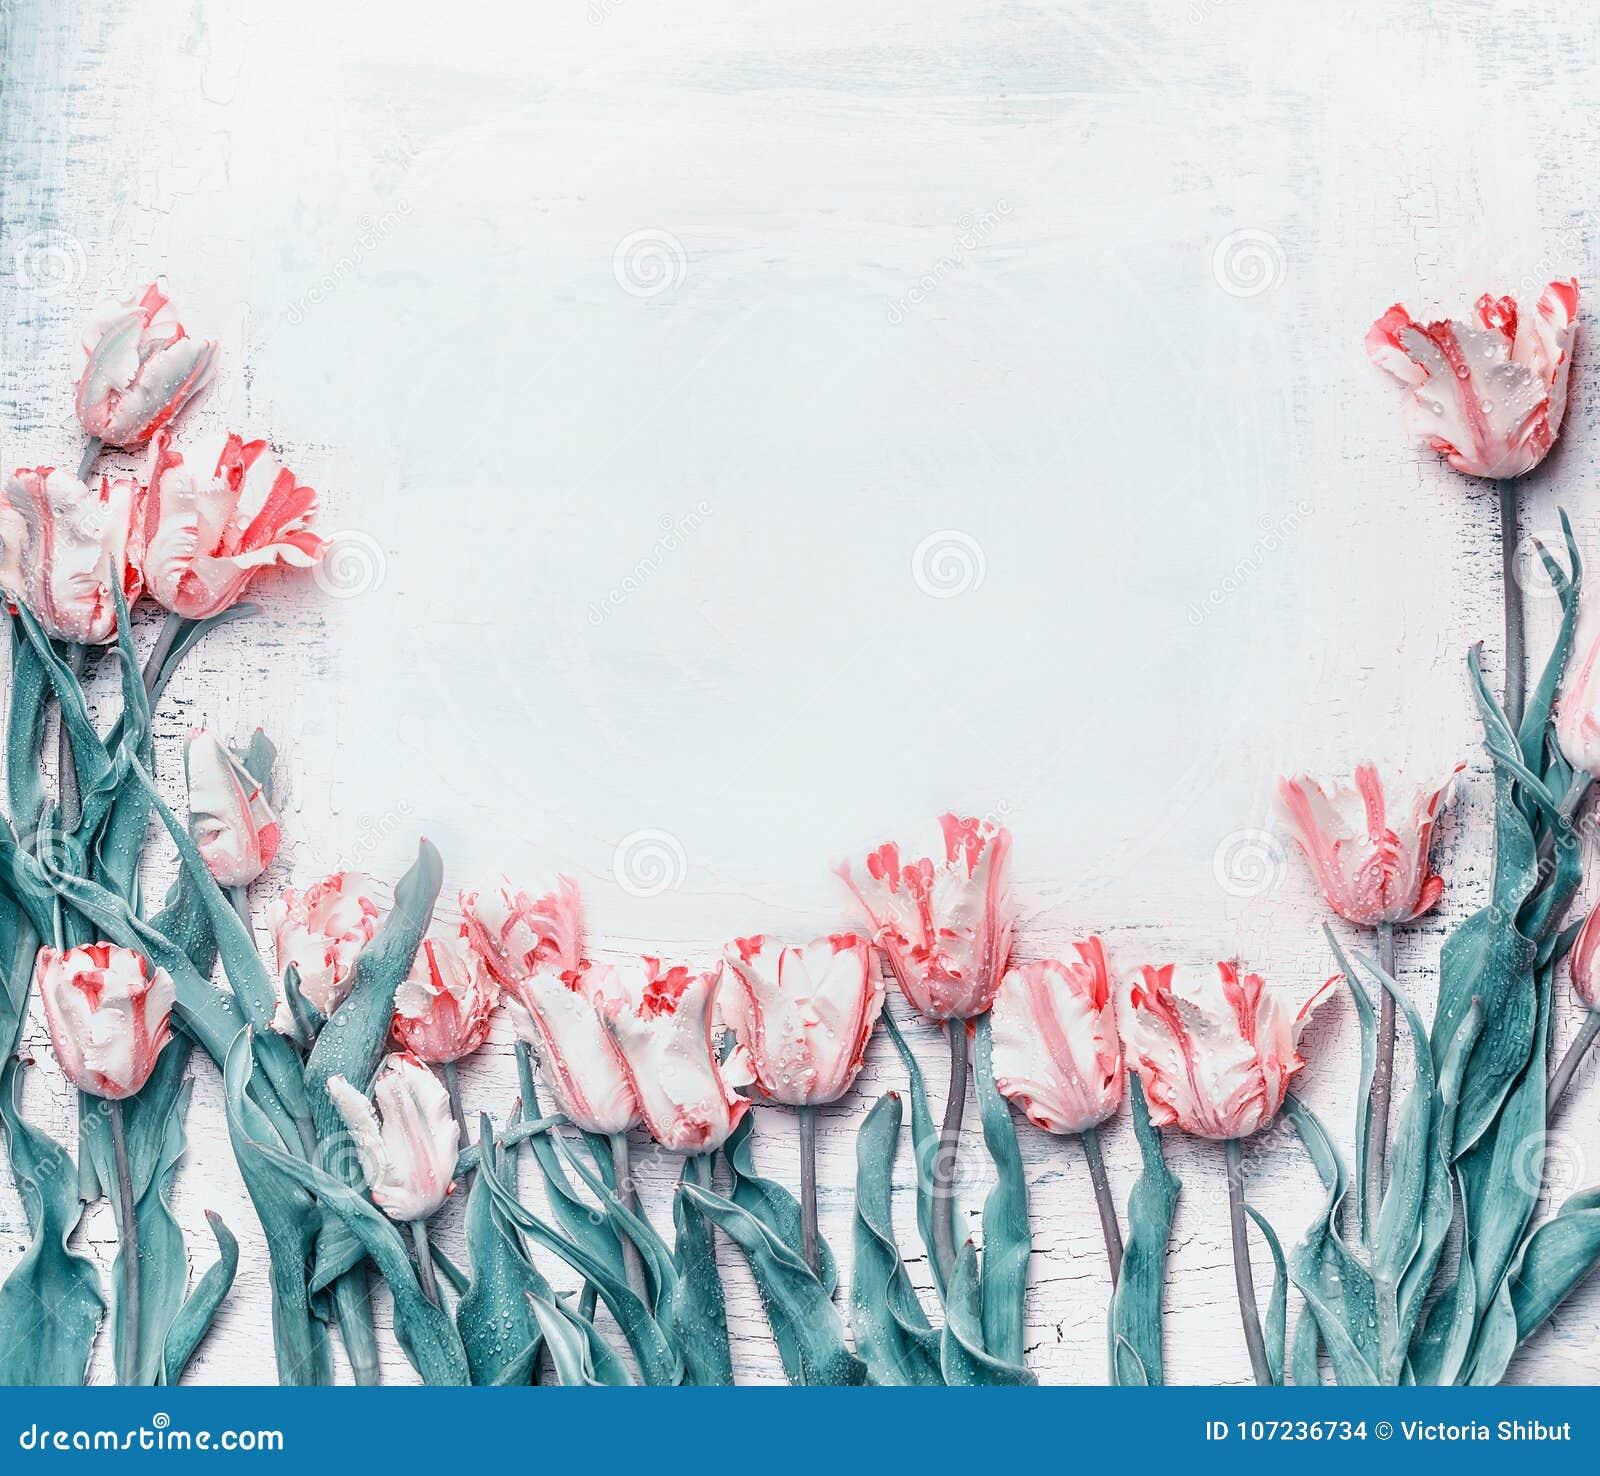 pastel pink tulips border springtime flowers background